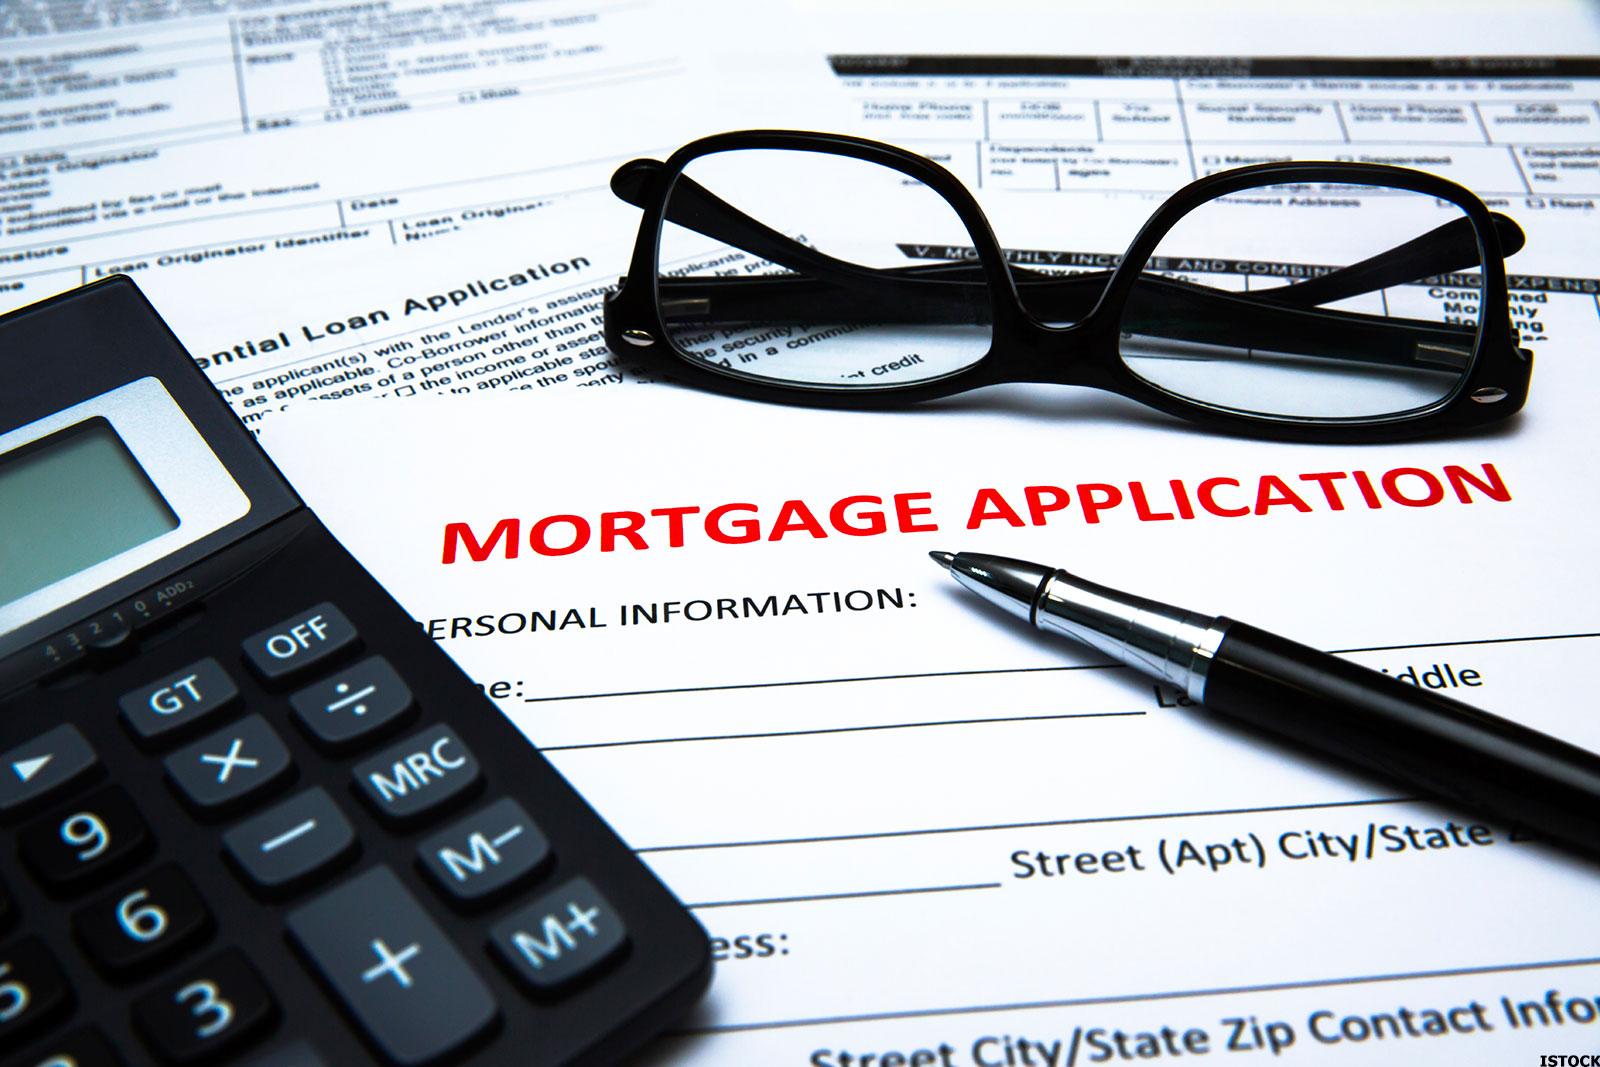 Mortgage Application Volumes Decrease 7.3% - TheStreet